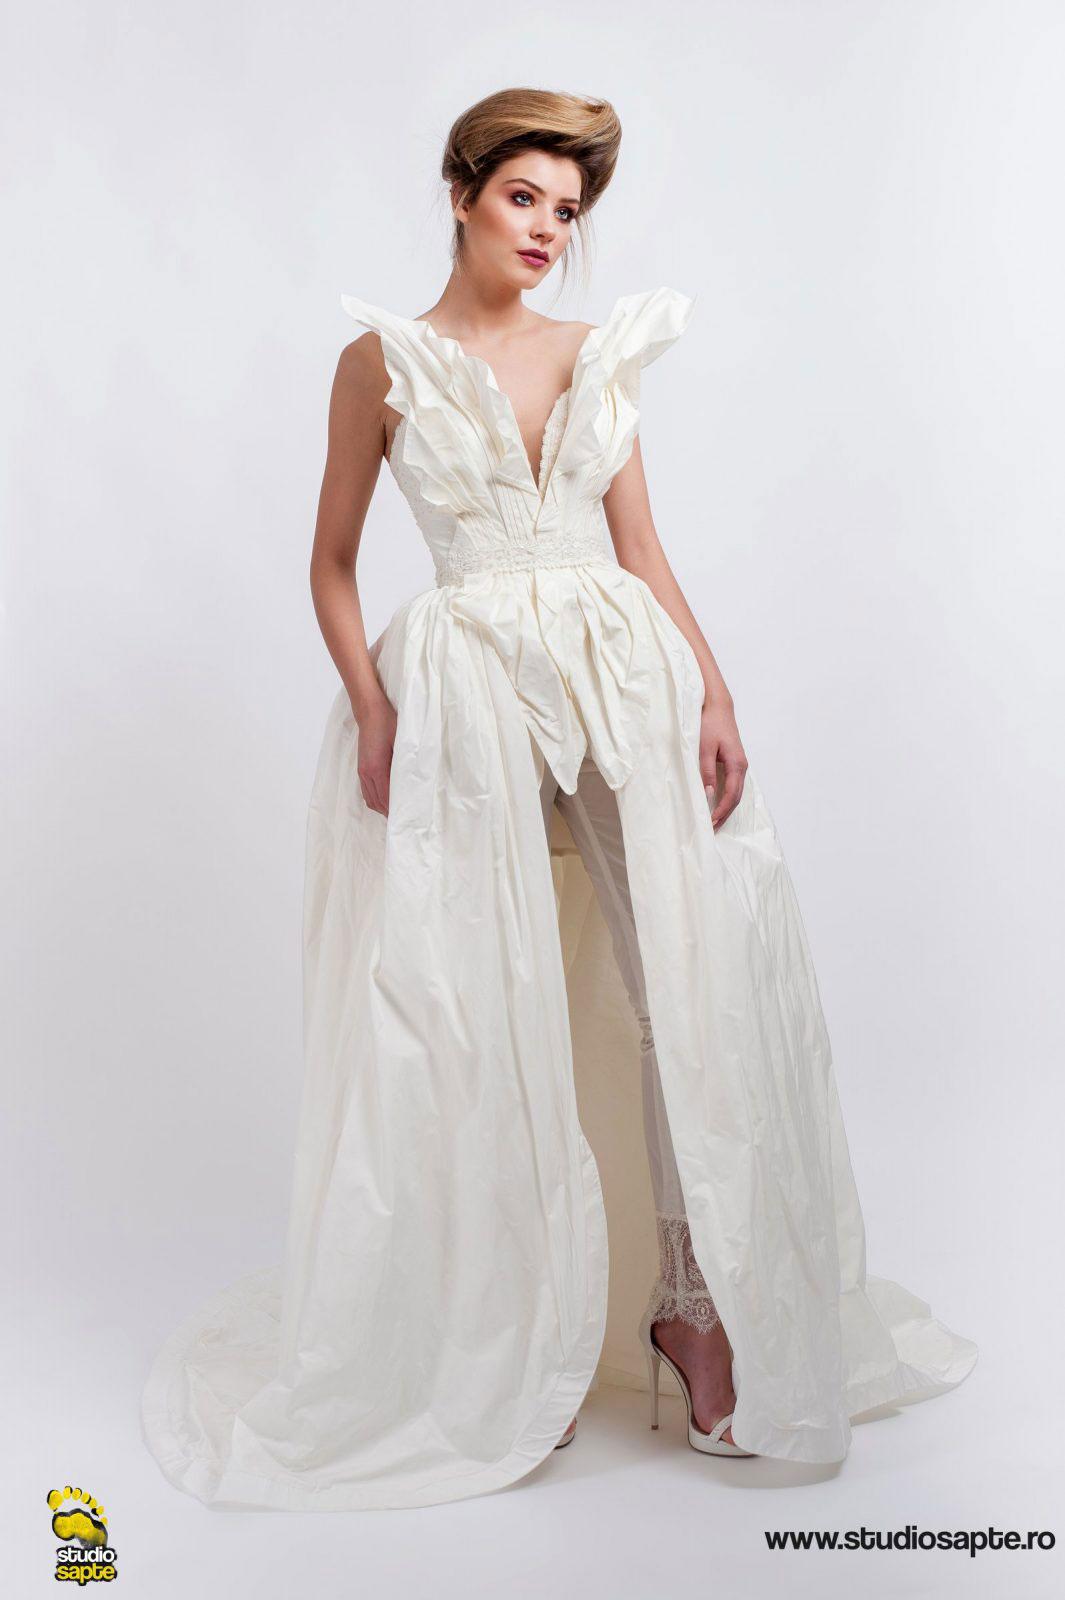 Rochie Mireasa cu Pantaloni | Moda | Fotograf | Studio Foto | Christina Andrei